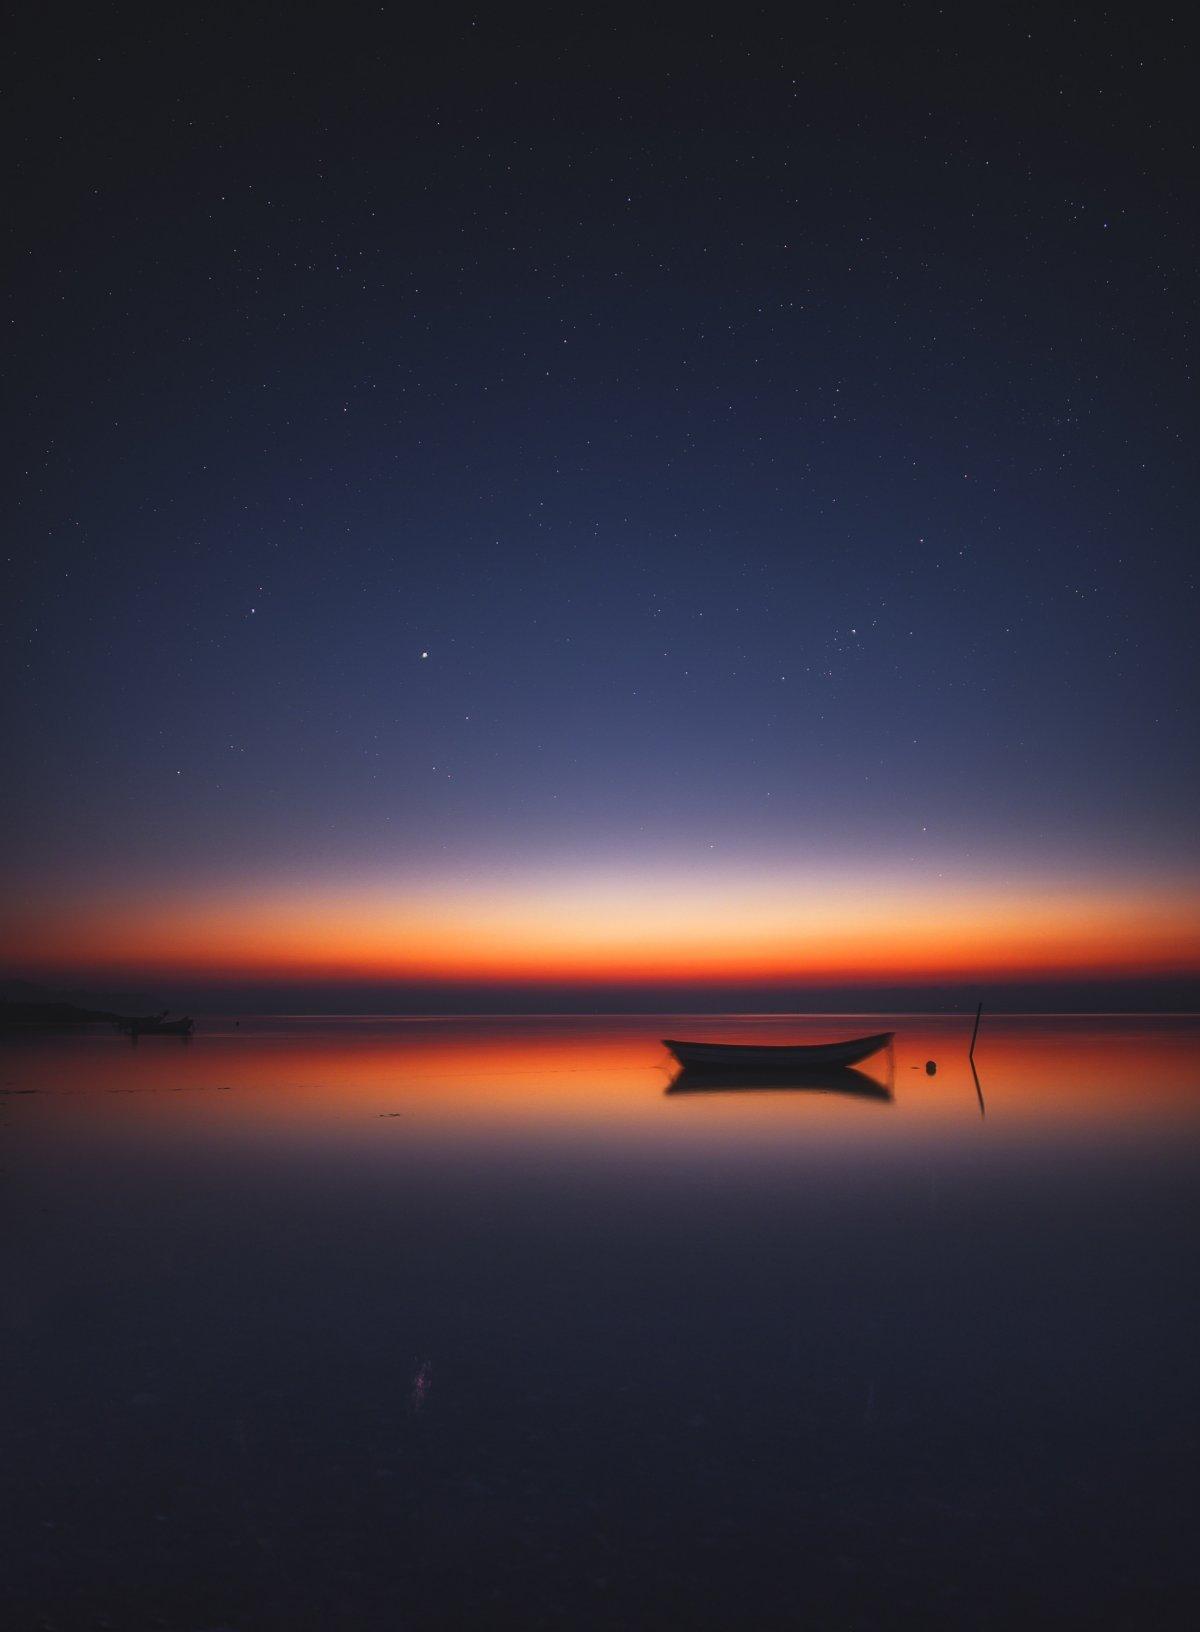 (Ruslan Merzlyakov/Insight Astronomy Photographer of the Year)